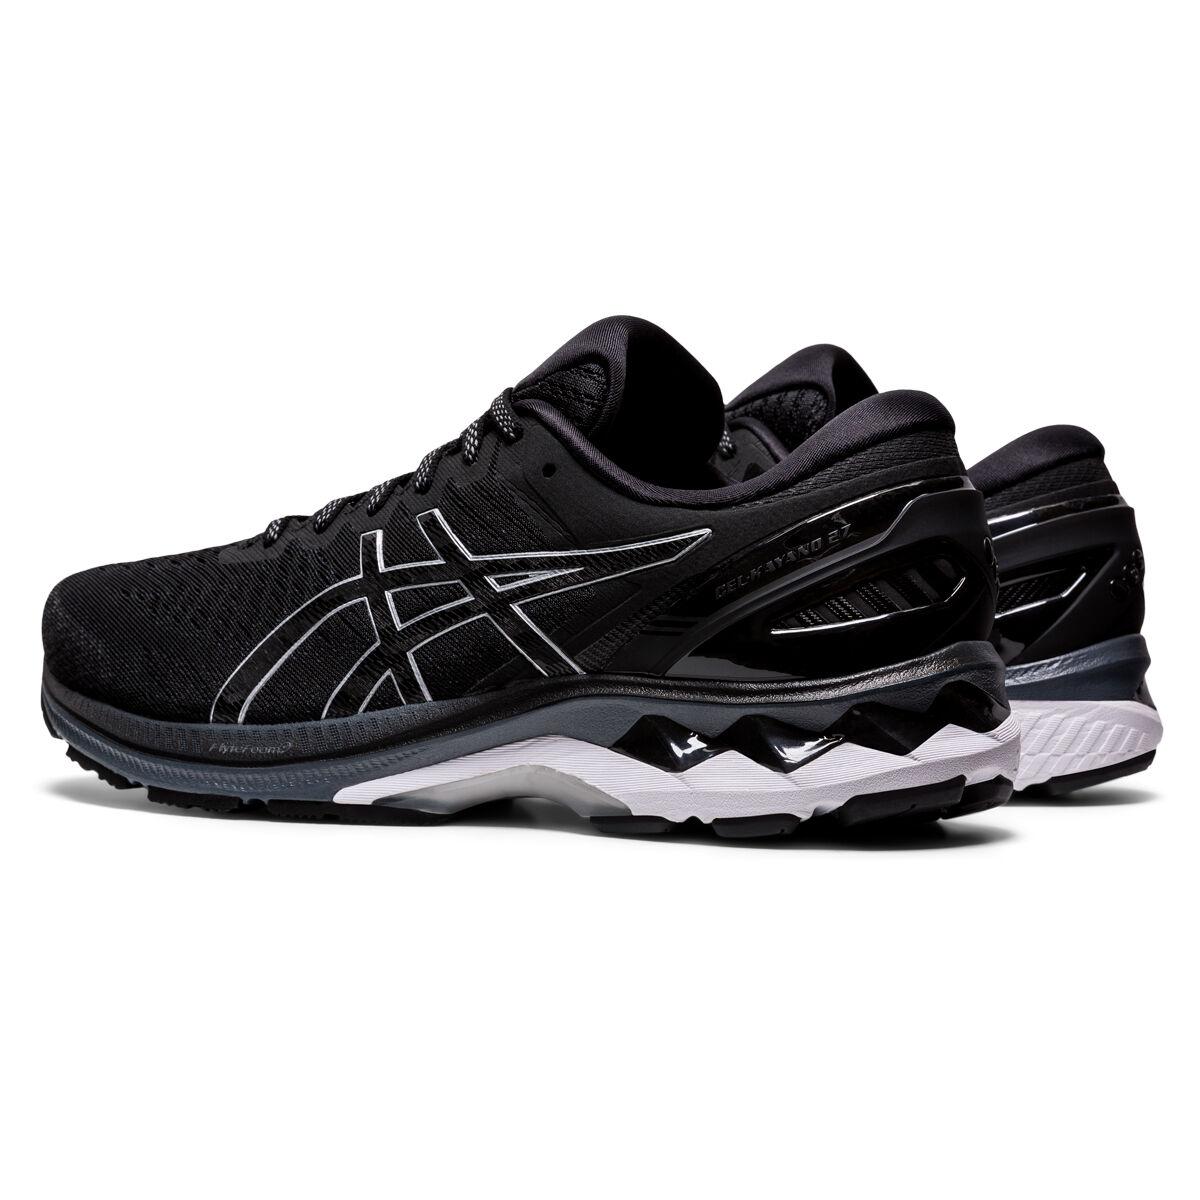 nike blazer retro red swoosh shoes black sneakers | Asics GEL Kayano 27 2E Mens Running Shoes